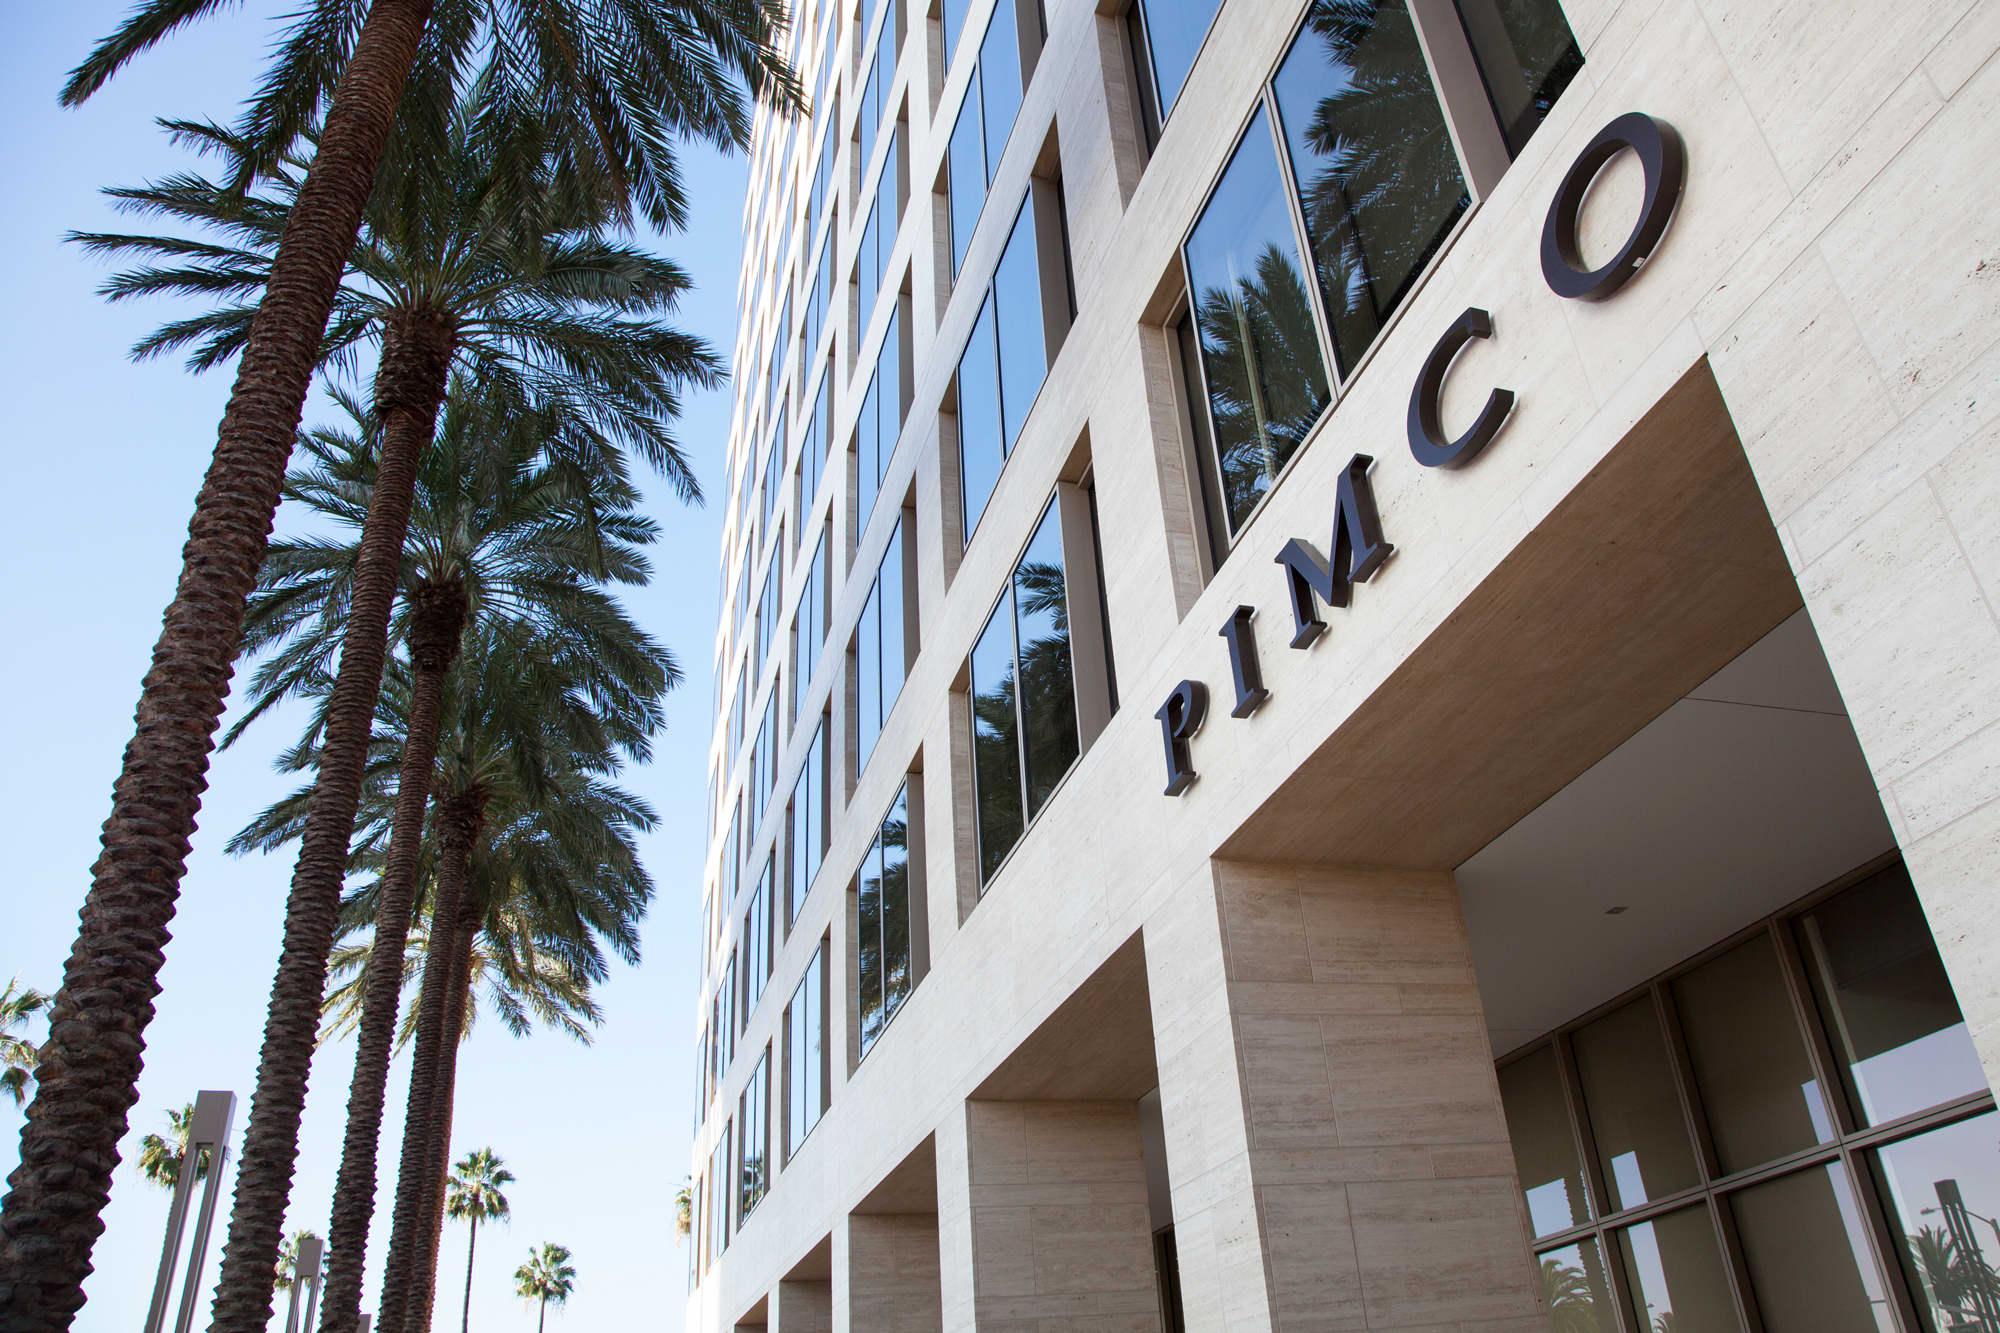 Pimco total return fund loses worlds biggest bond fund title biocorpaavc